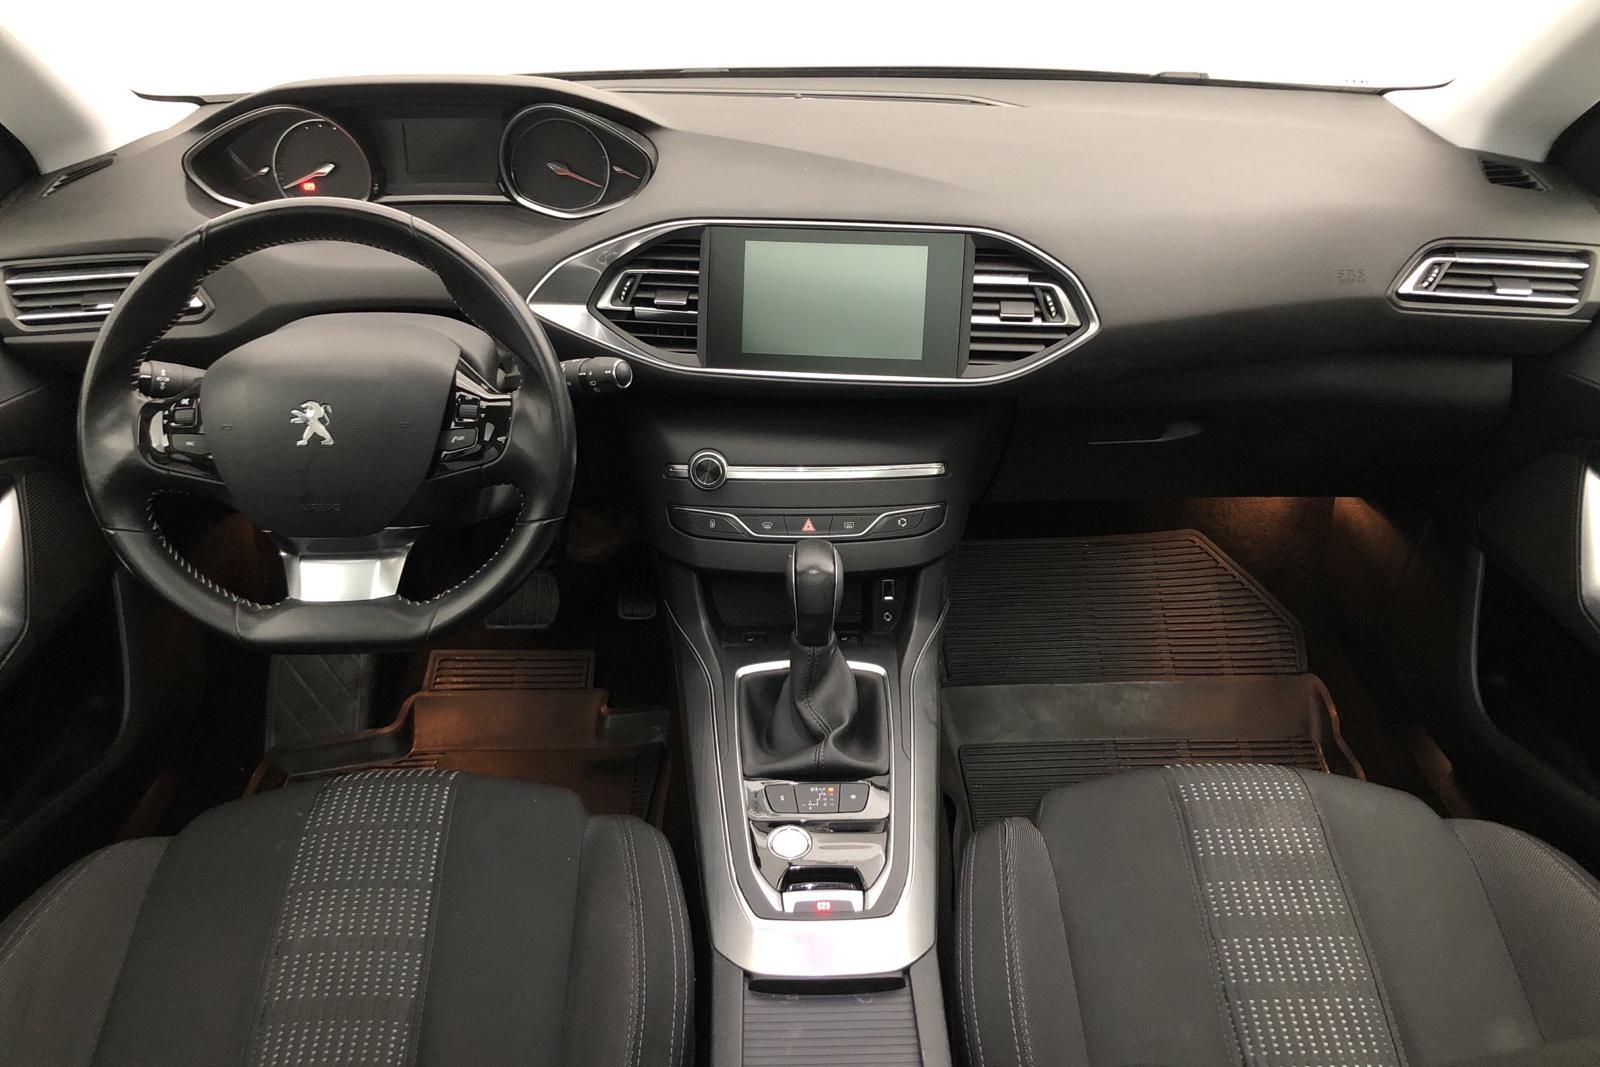 Peugeot 308 SW BlueHDi (120hk) - 5 539 mil - Automat - svart - 2015